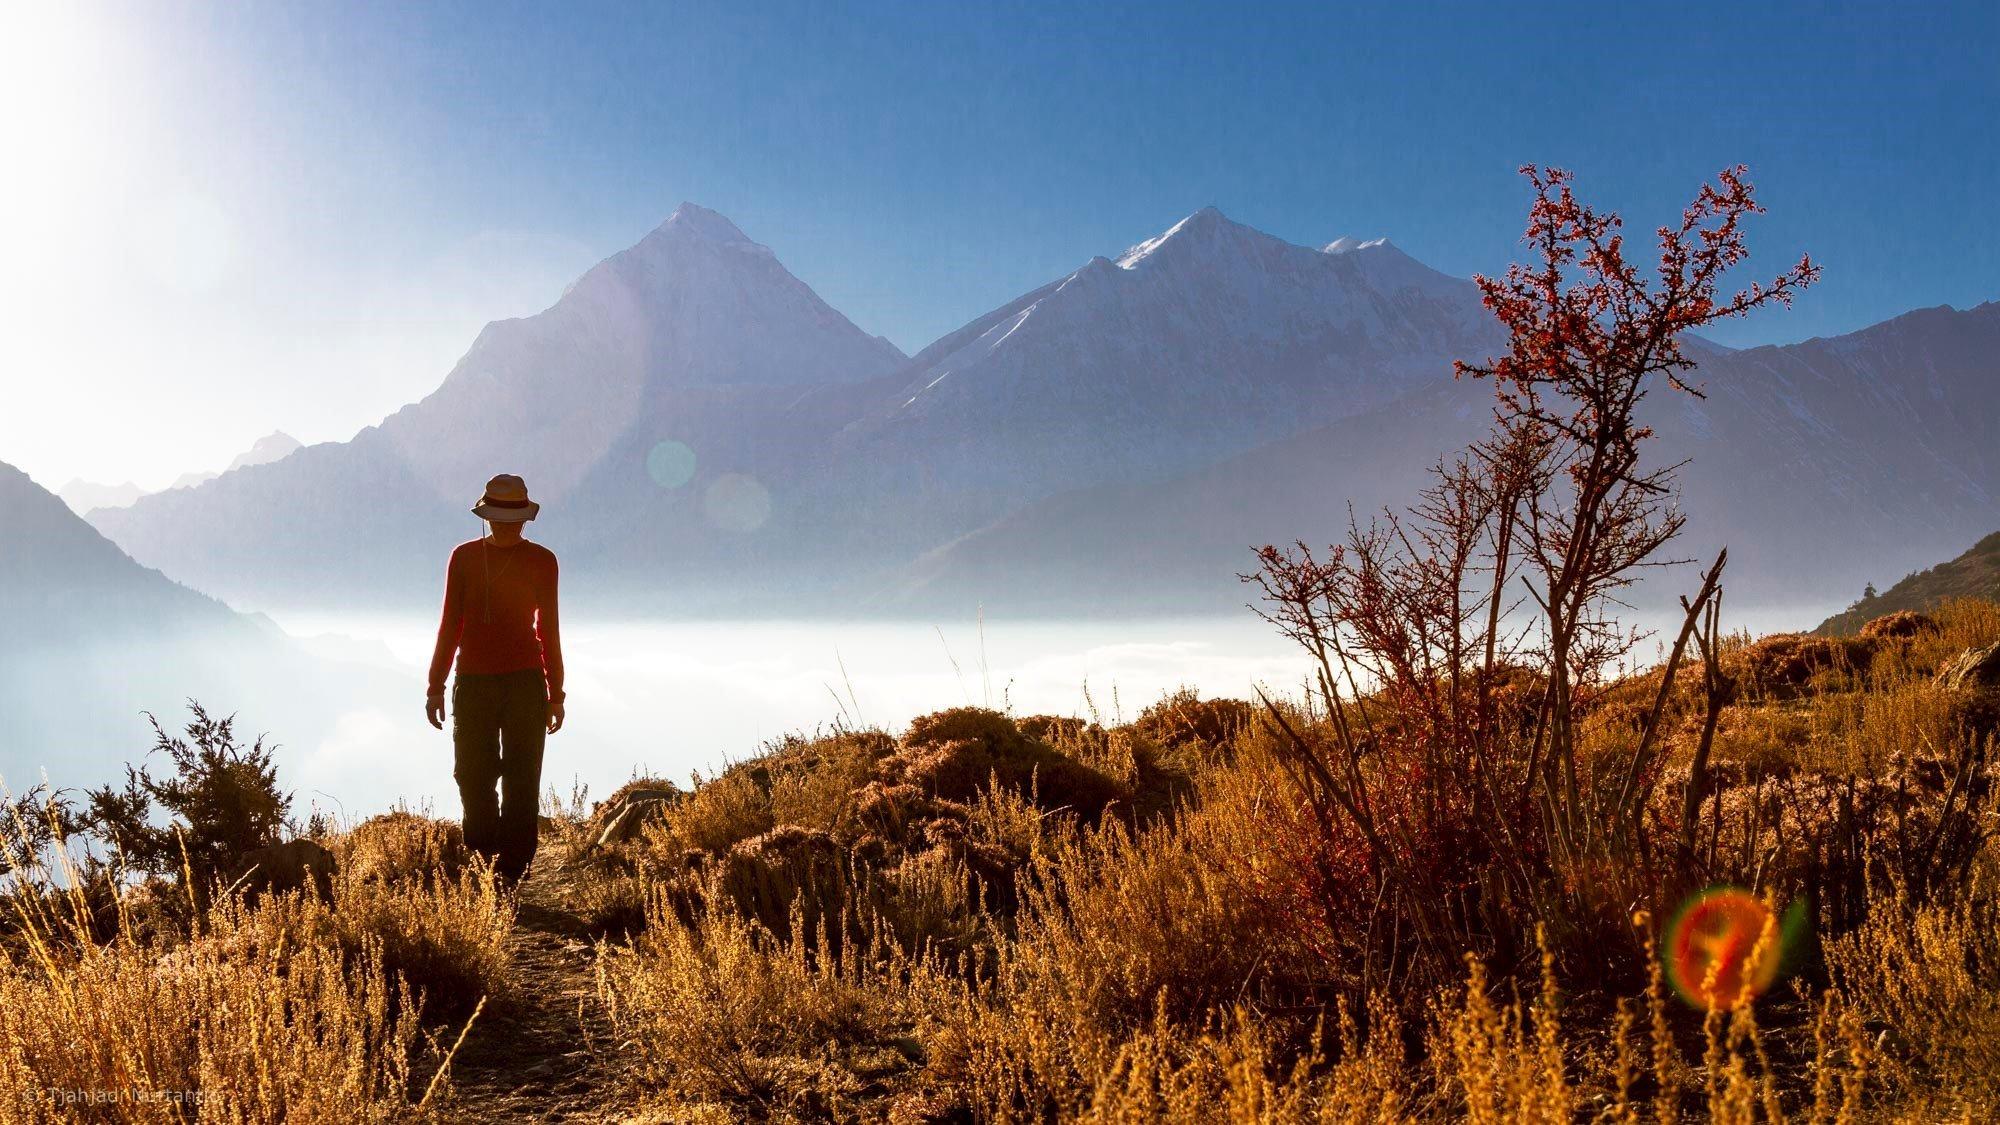 Nurtantio_5Pässe_Lager Kaisang Kharka 3500 m mit Dhaulagiri und Tukche Peak